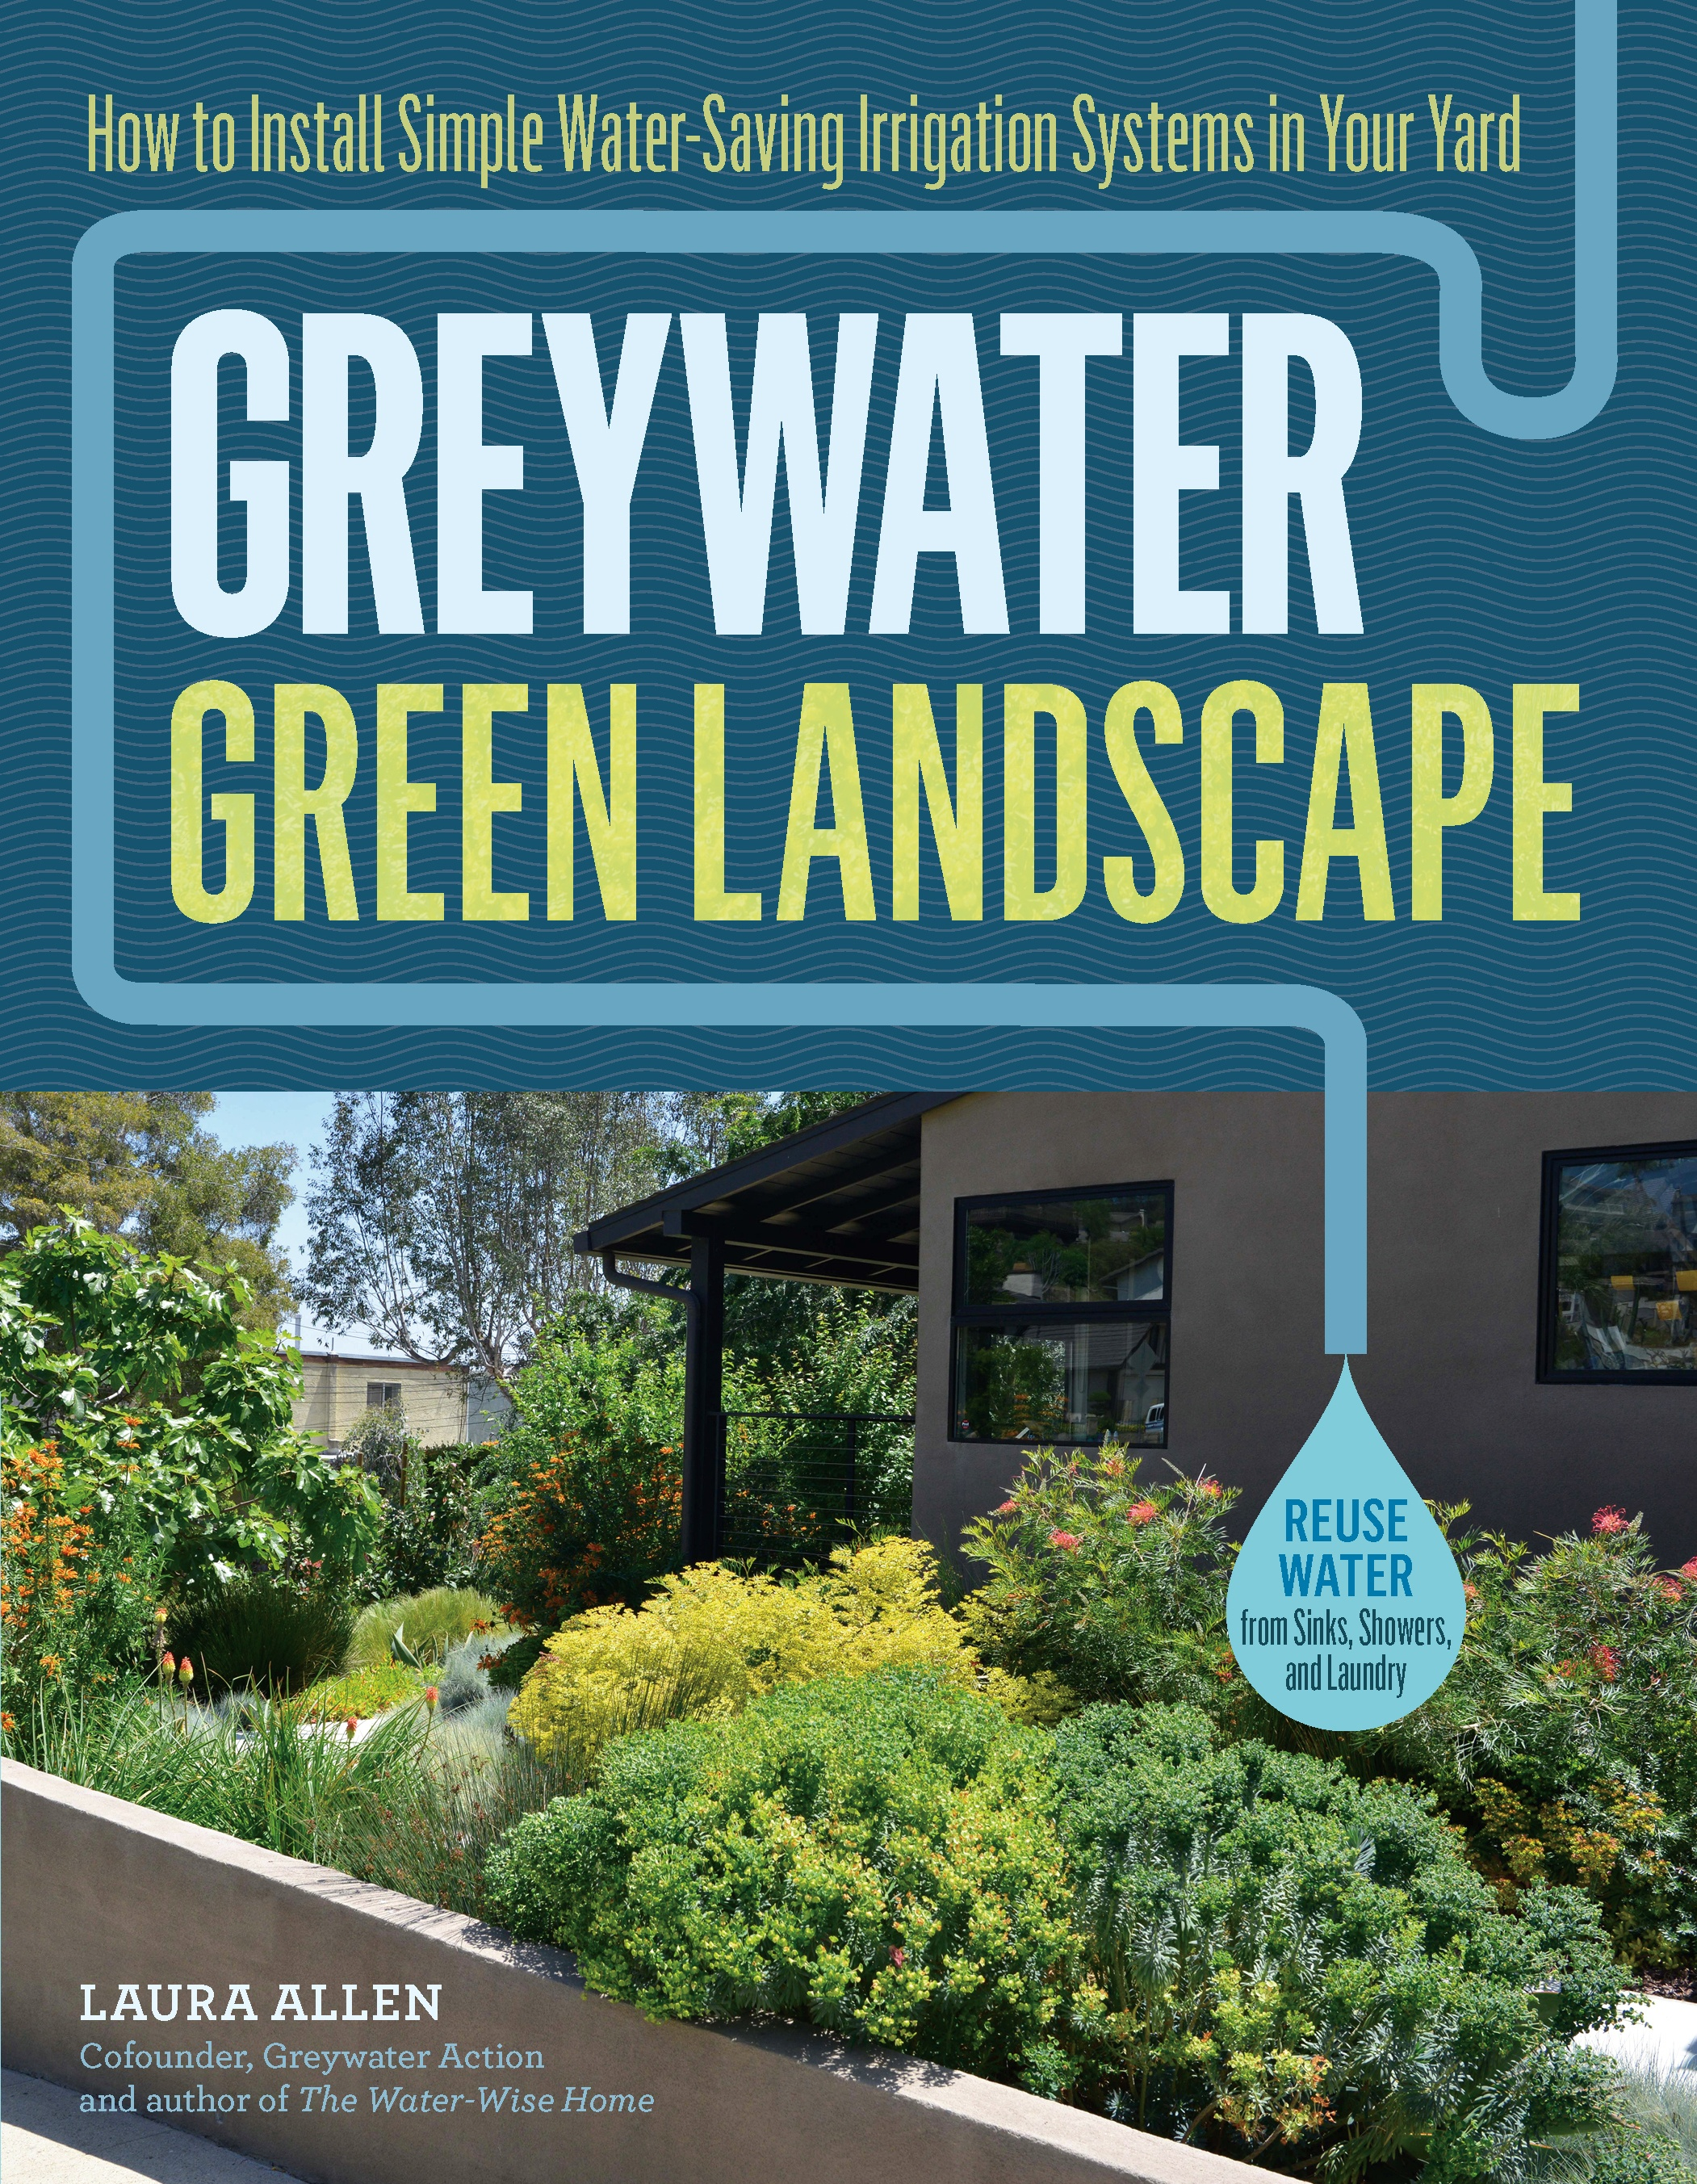 Laura Allen Greywater, Green Landscape